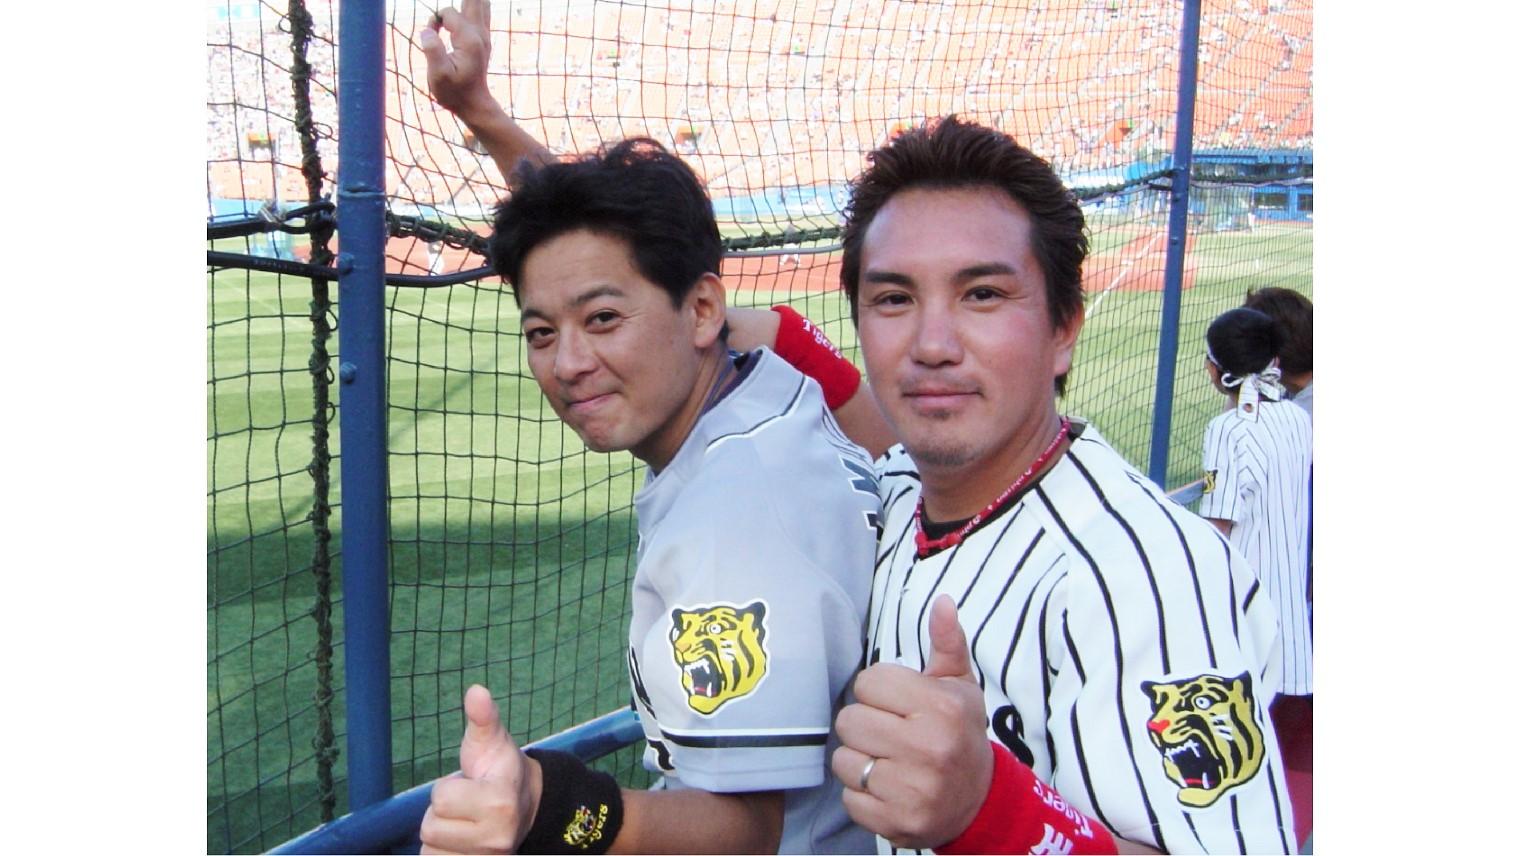 Sony Startup Acceleration Program アクセラレーター 水間浩彰。草野球の仲間と野球観戦。